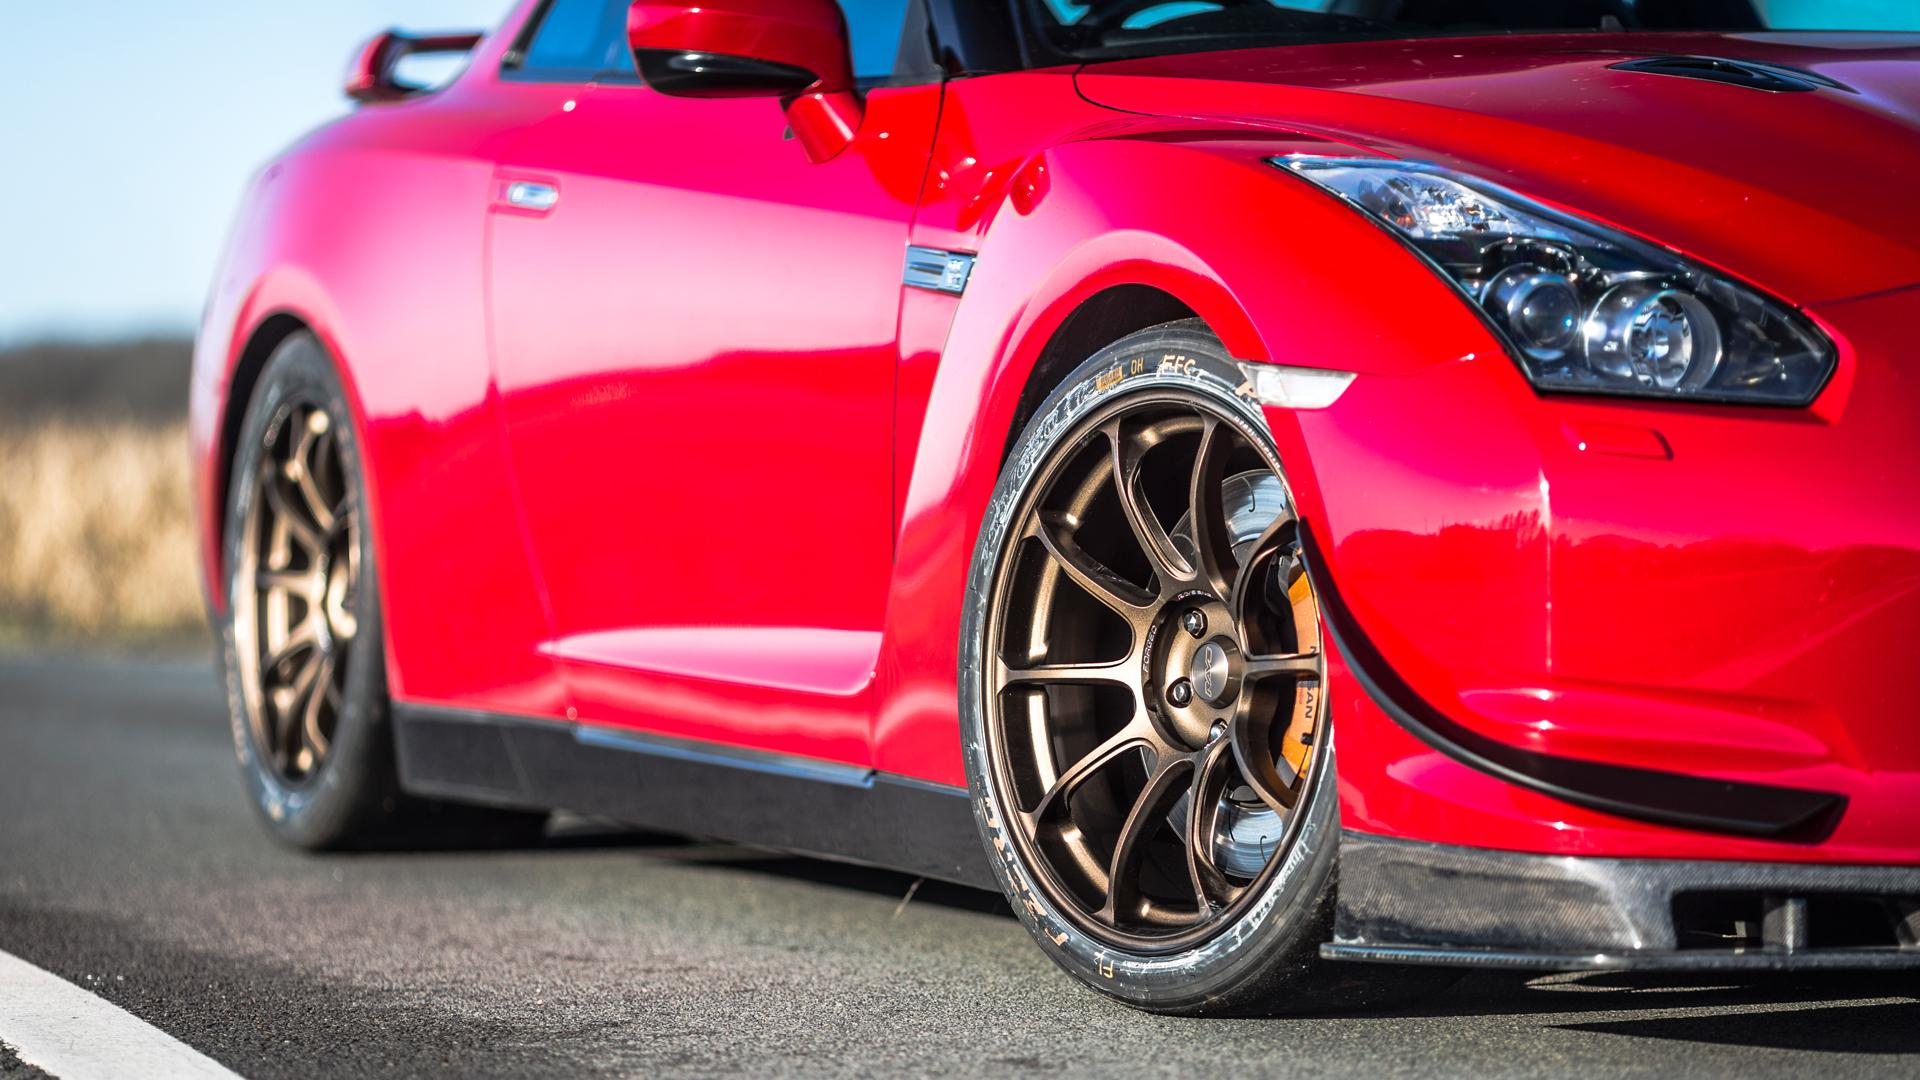 1000HP Nissan GTR Driving Experience Drift Limits